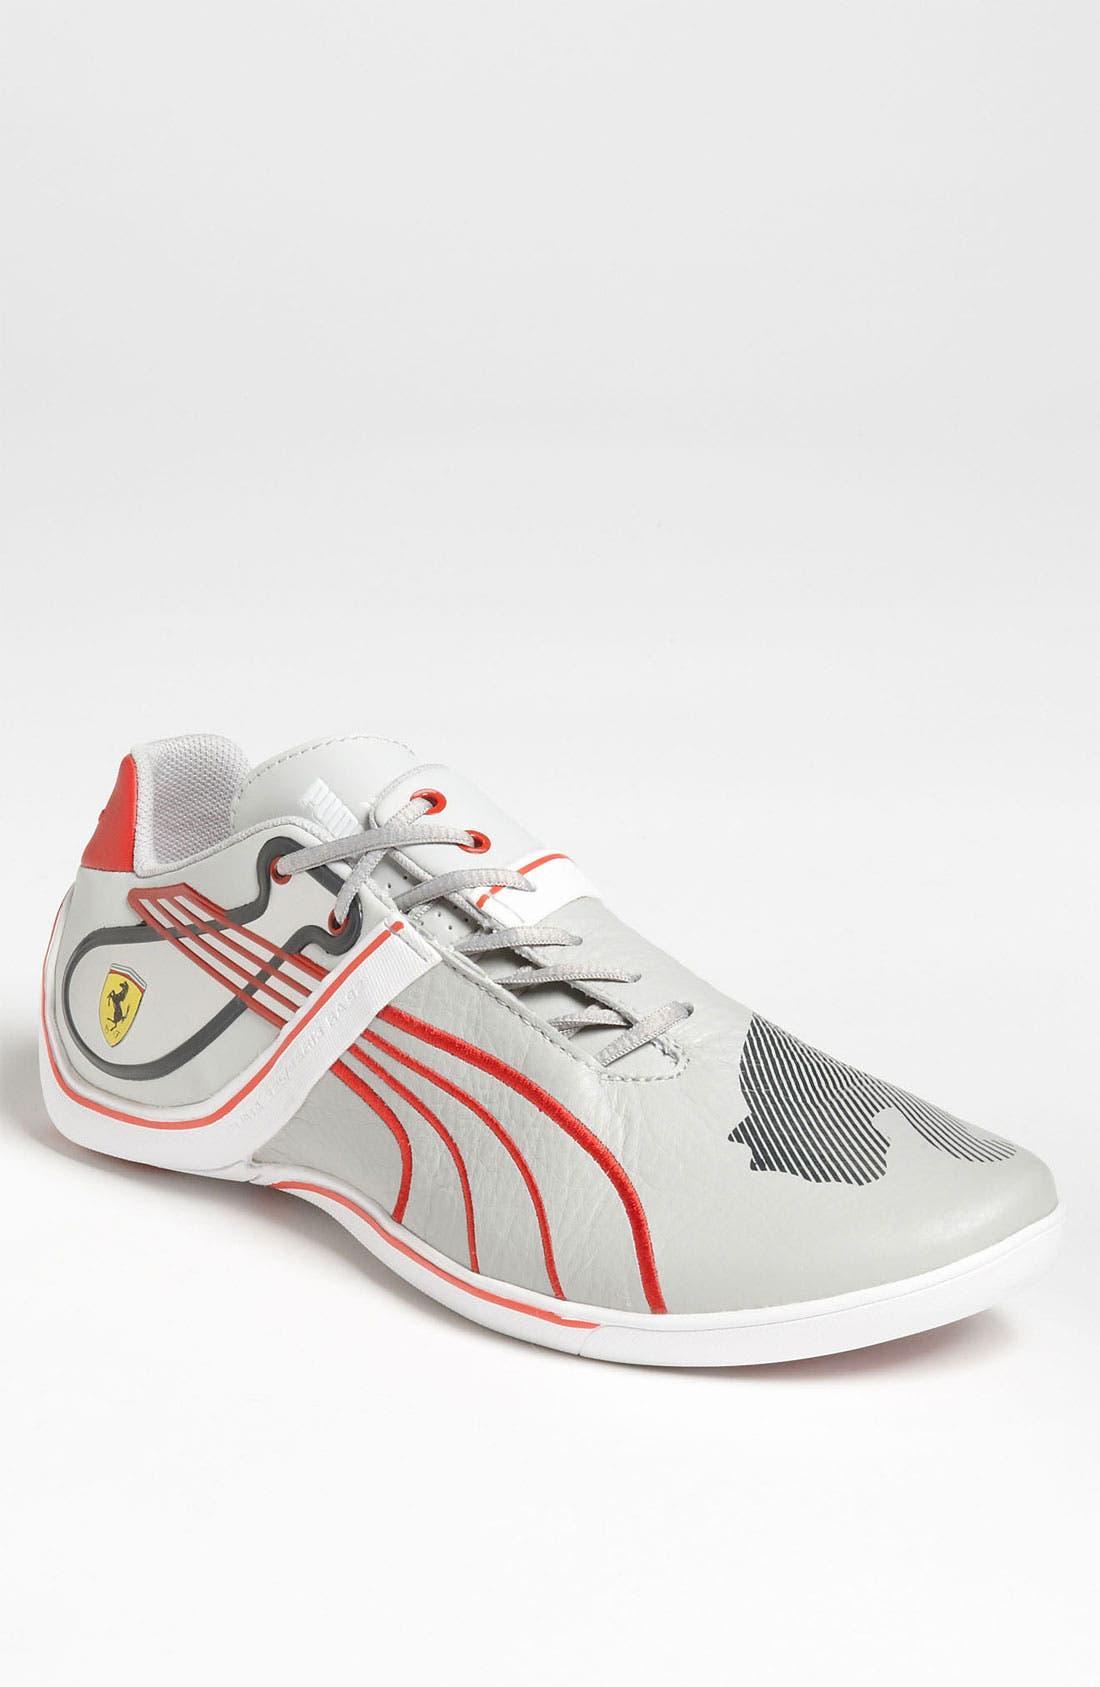 Alternate Image 1 Selected - PUMA 'Ferrari Future Cat Remix 2' Sneaker (Men)